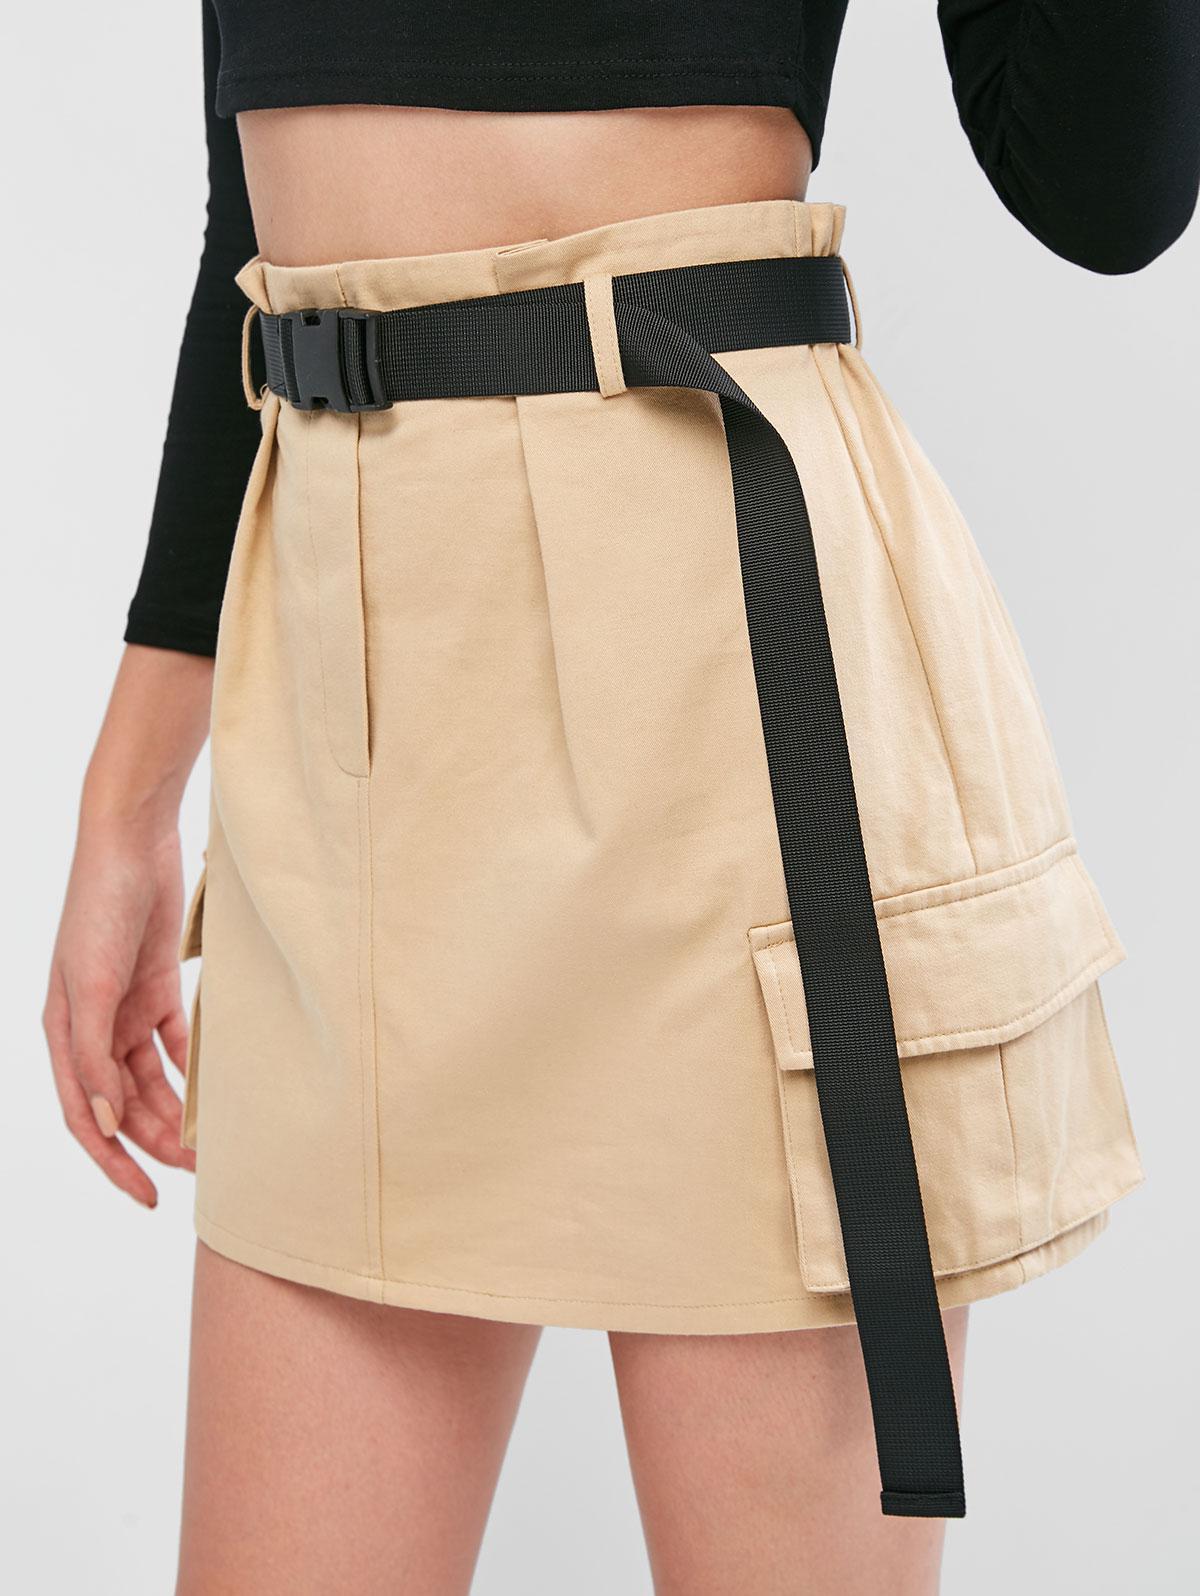 ZAFUL Pockets Belted Mini Paperbag Skirt